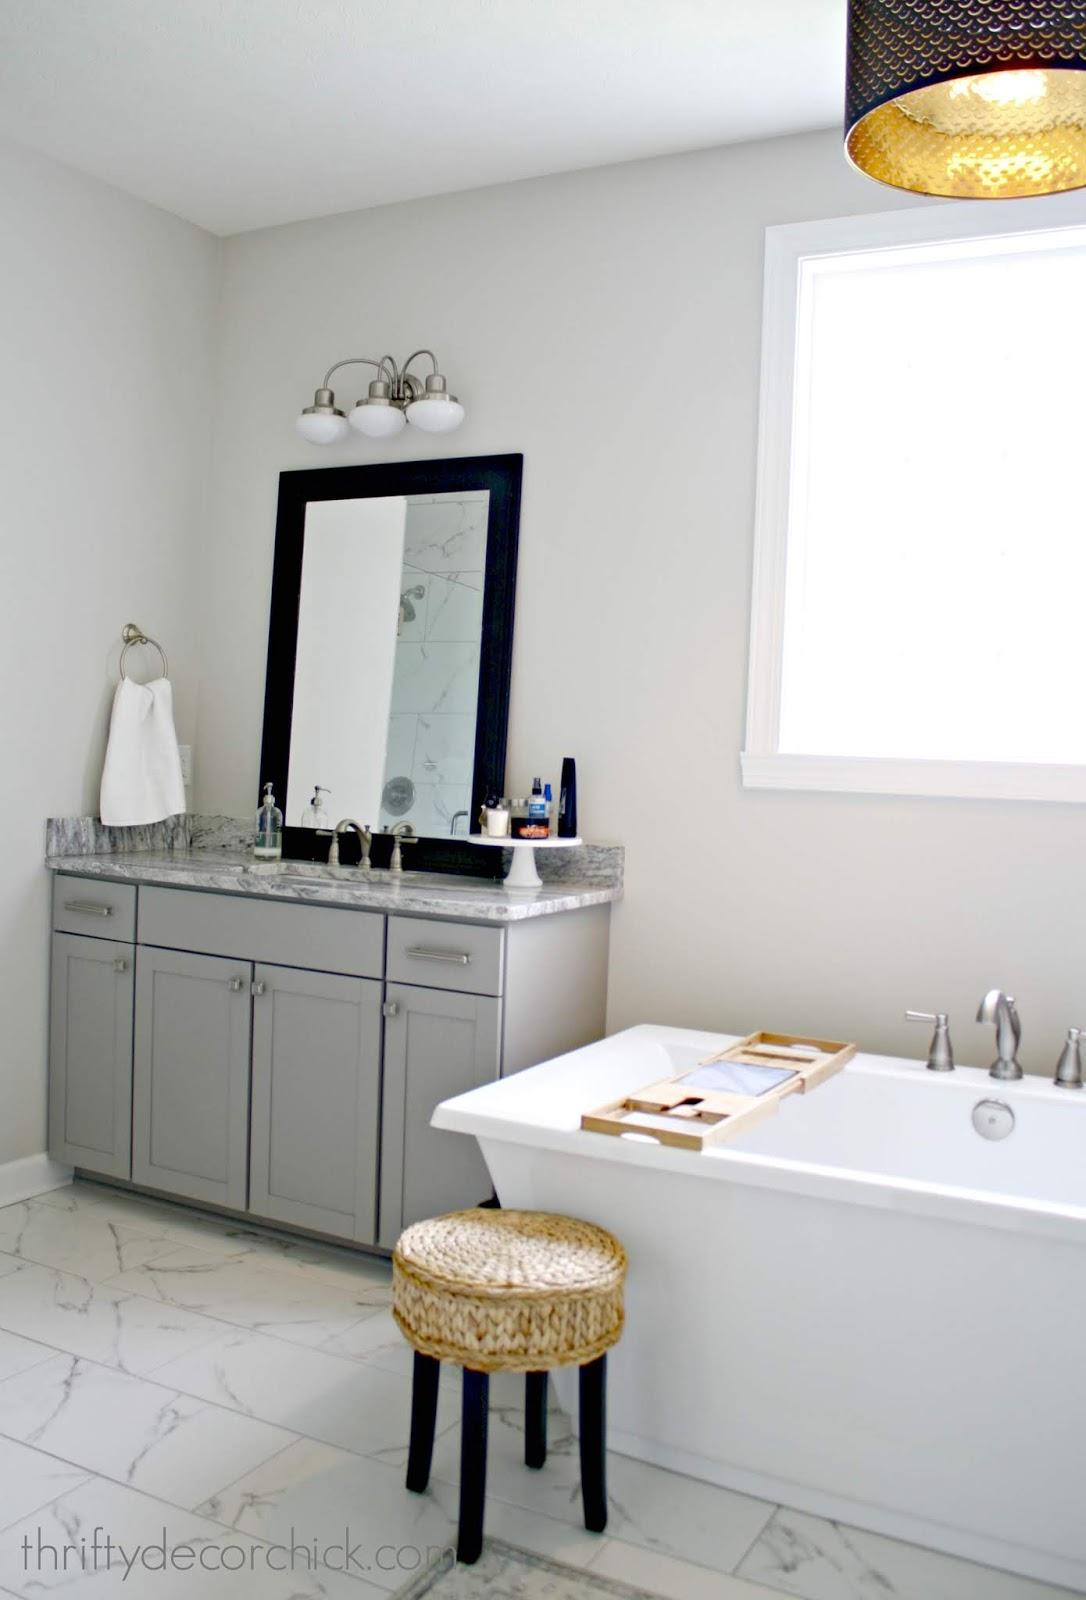 Bathroom vanity with no storage